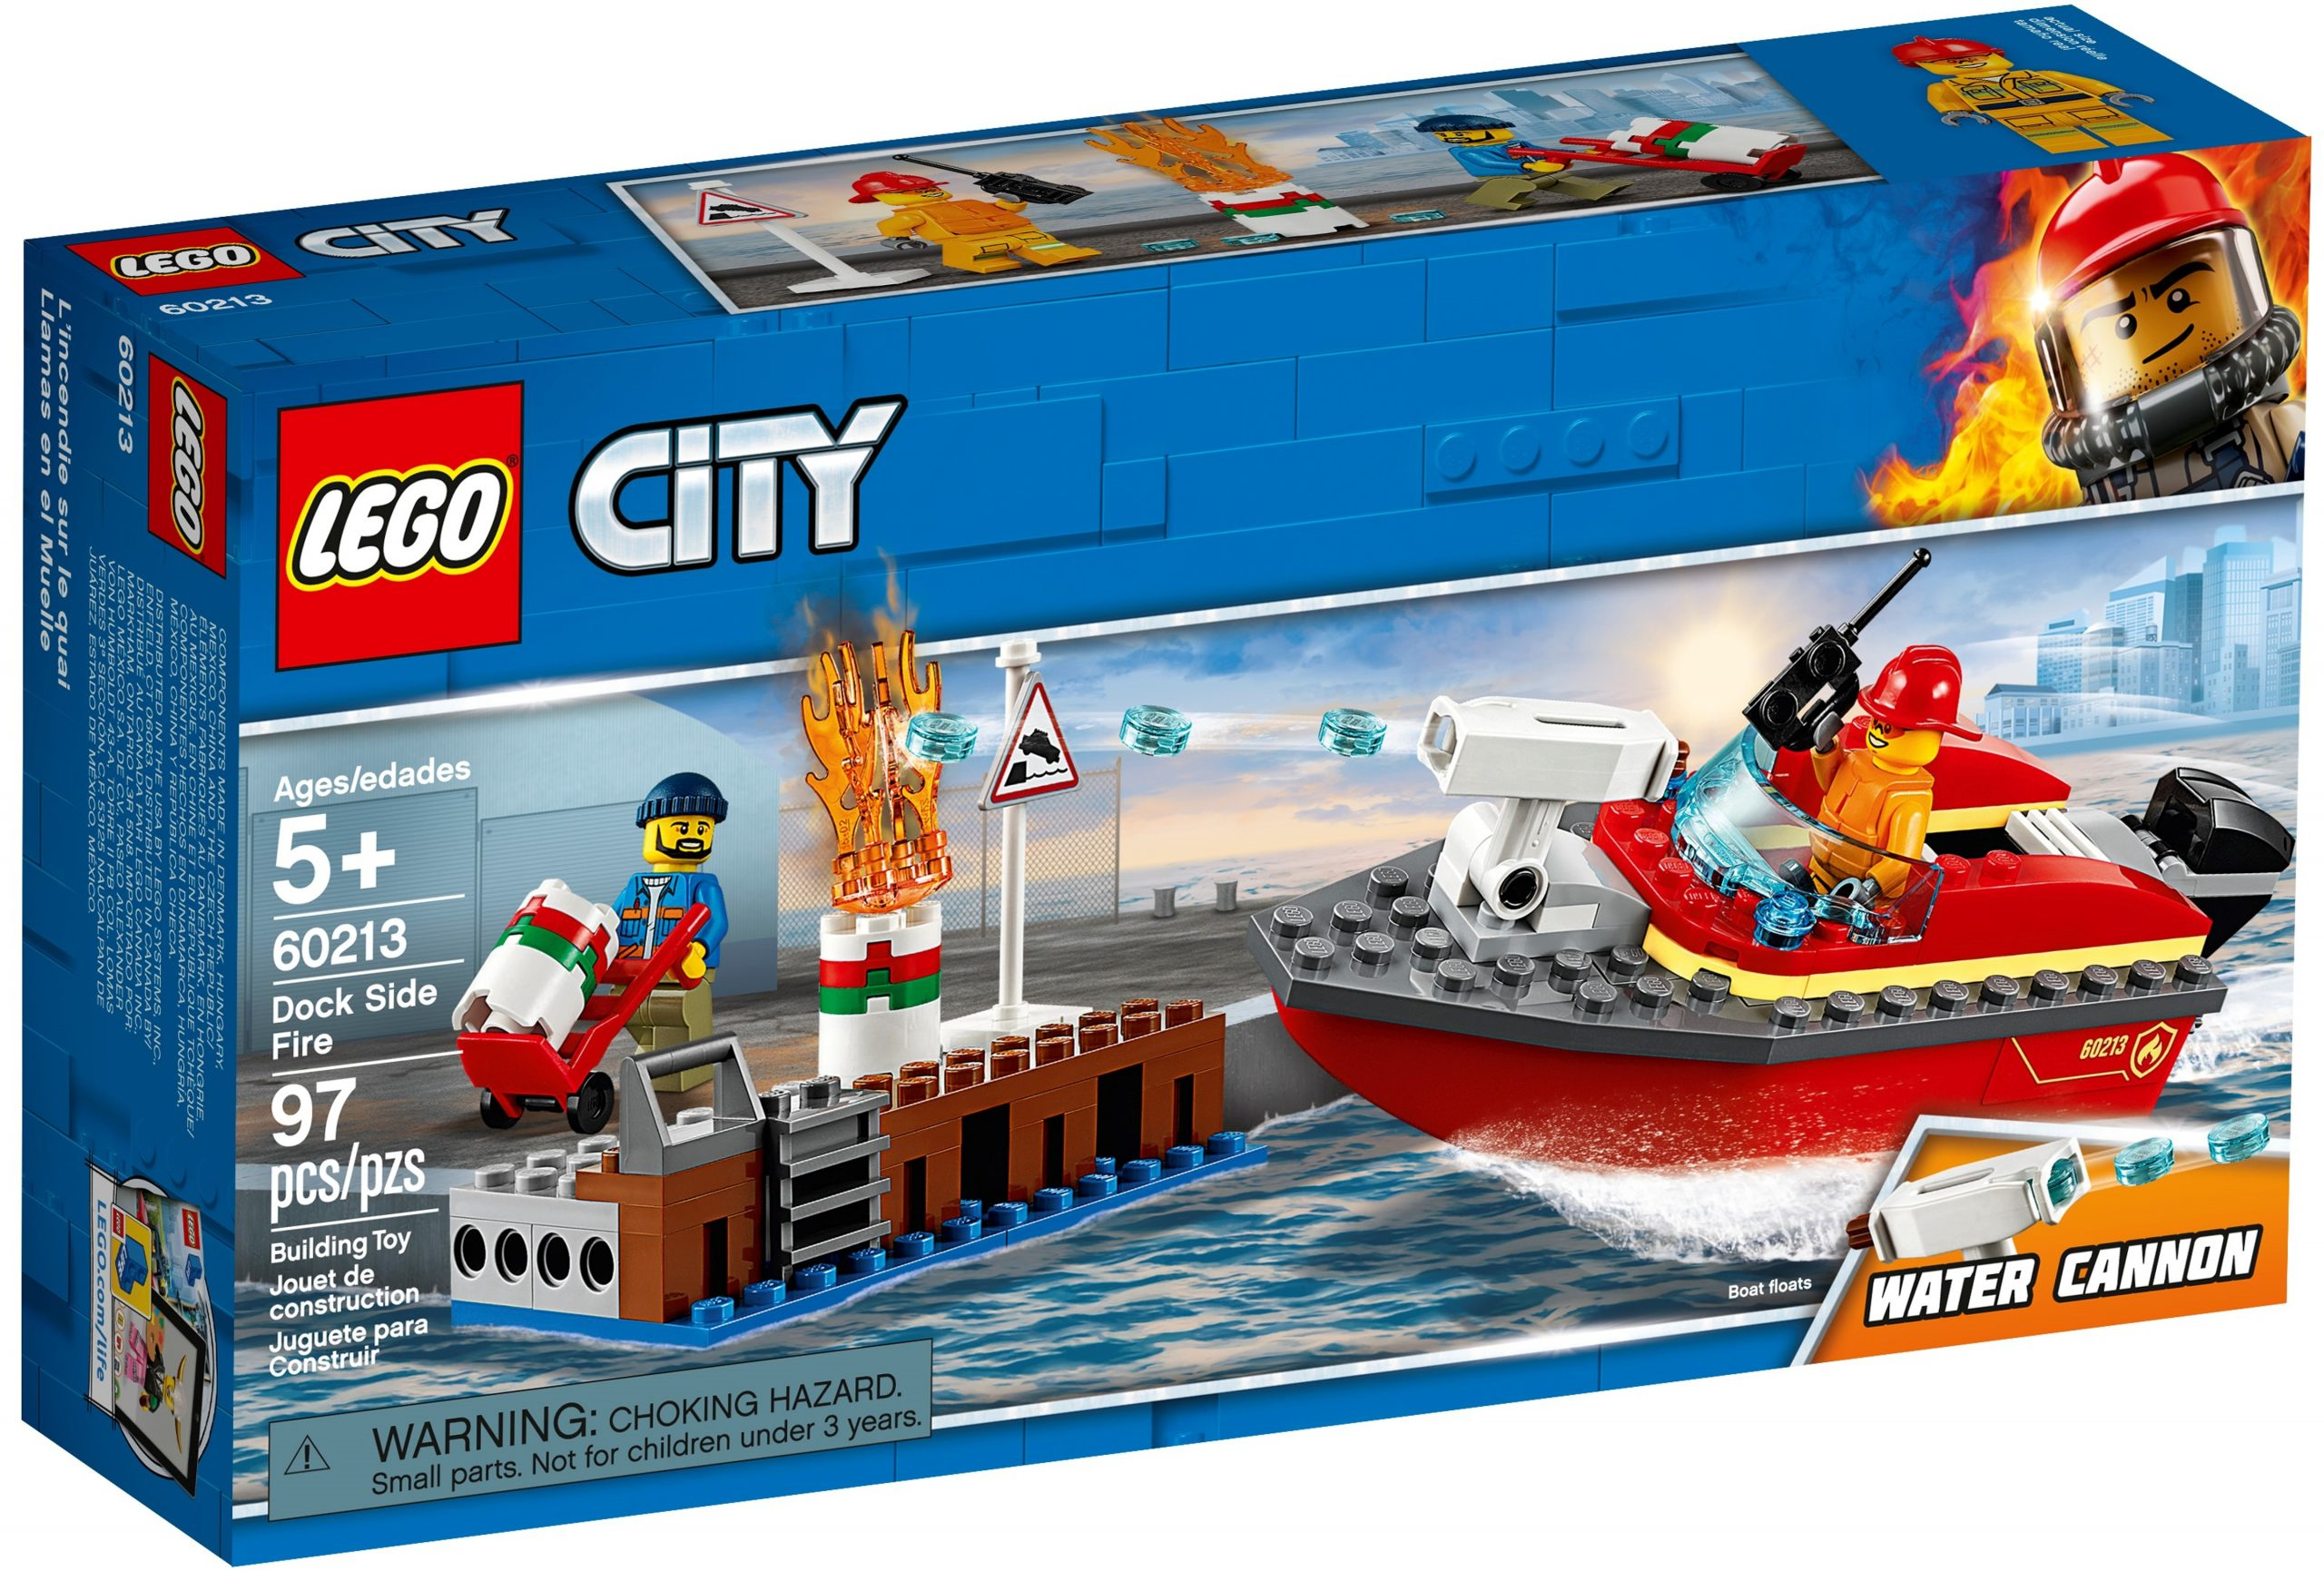 lego 60213 dock side fire scaled